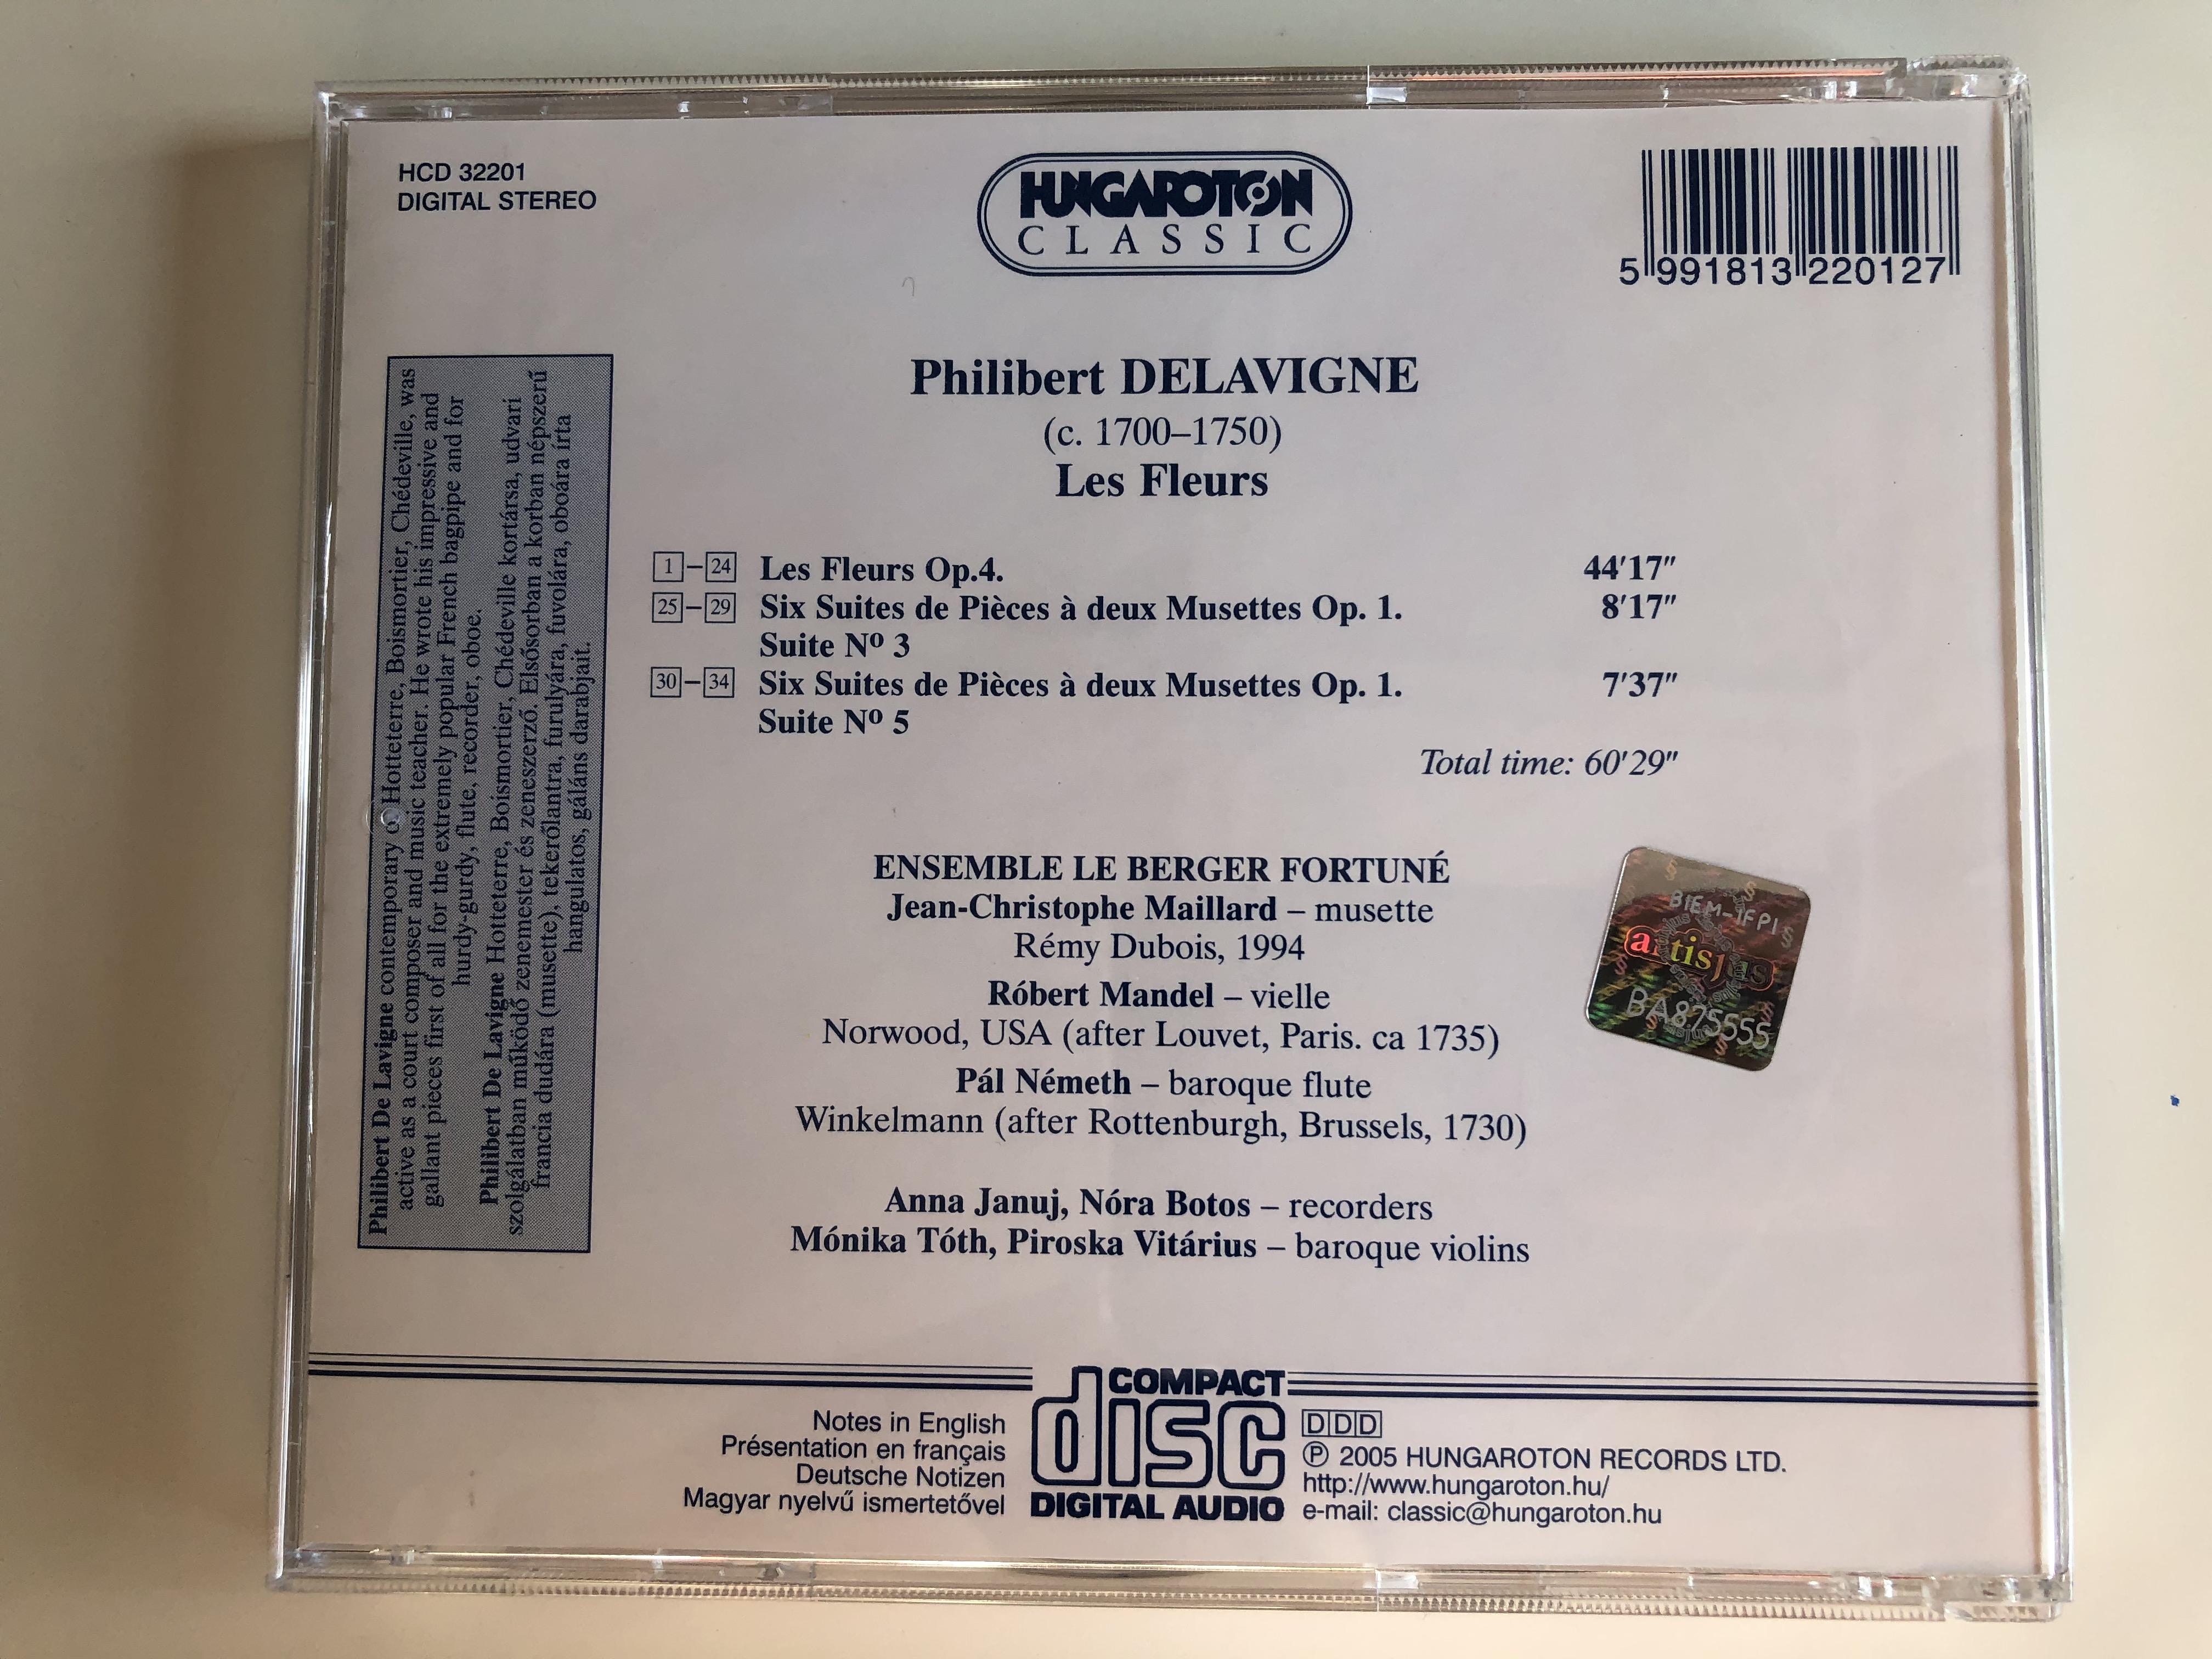 philibert-delavigne-les-fleurs-robert-mandel-jean-christophe-maillard-pal-nemeth-hungaroton-classic-audio-cd-2005-stereo-hcd-32201-8-.jpg